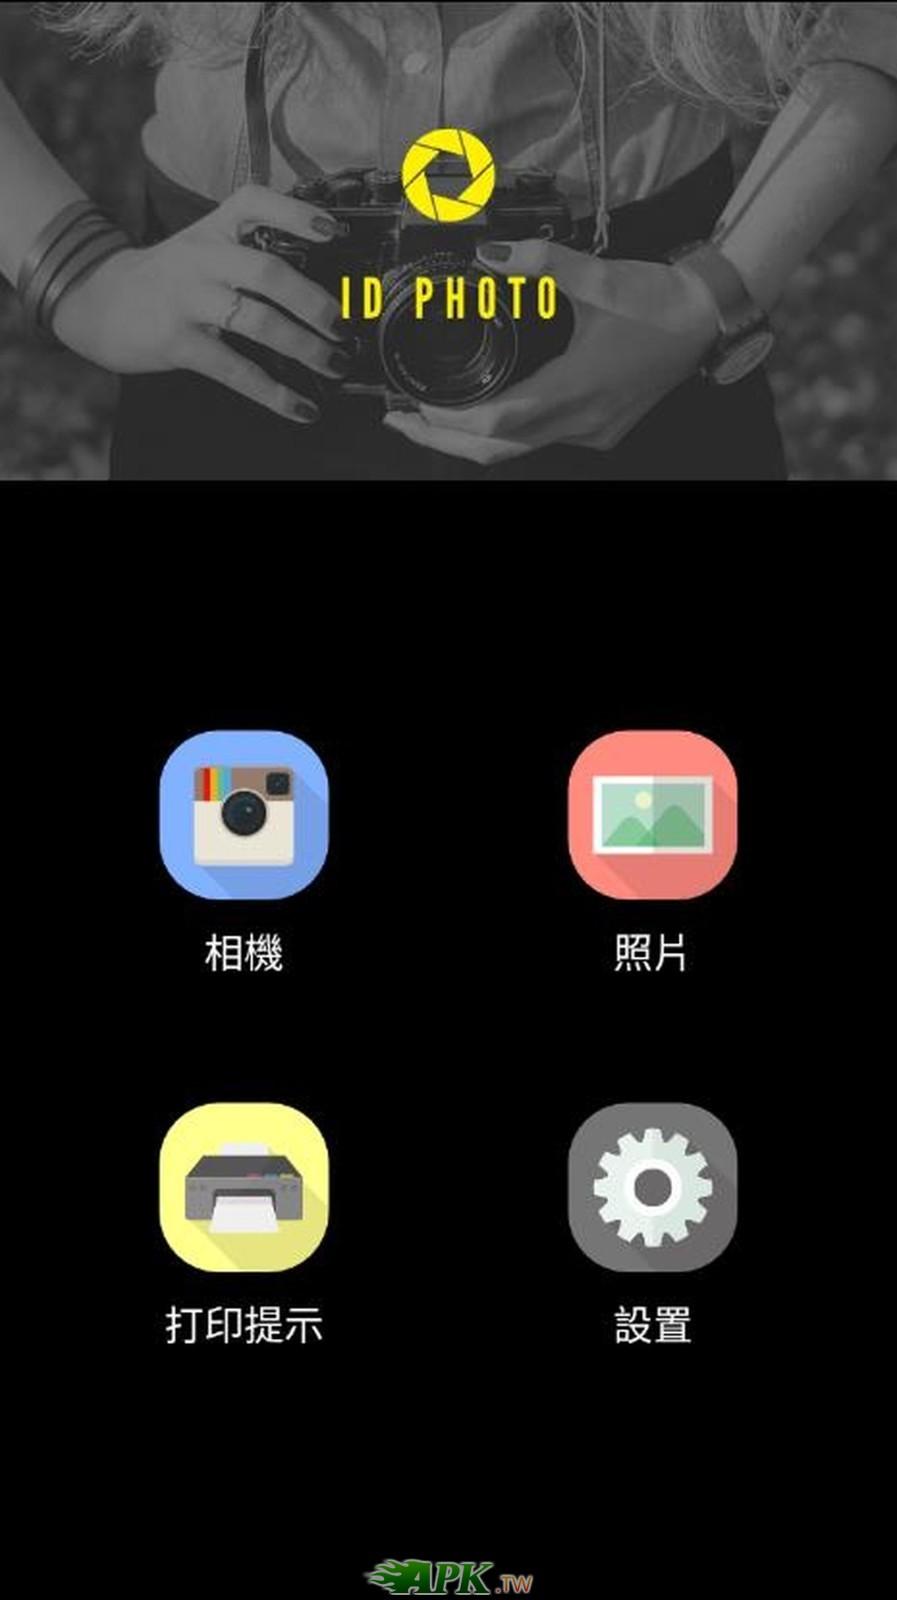 ID__3.jpg